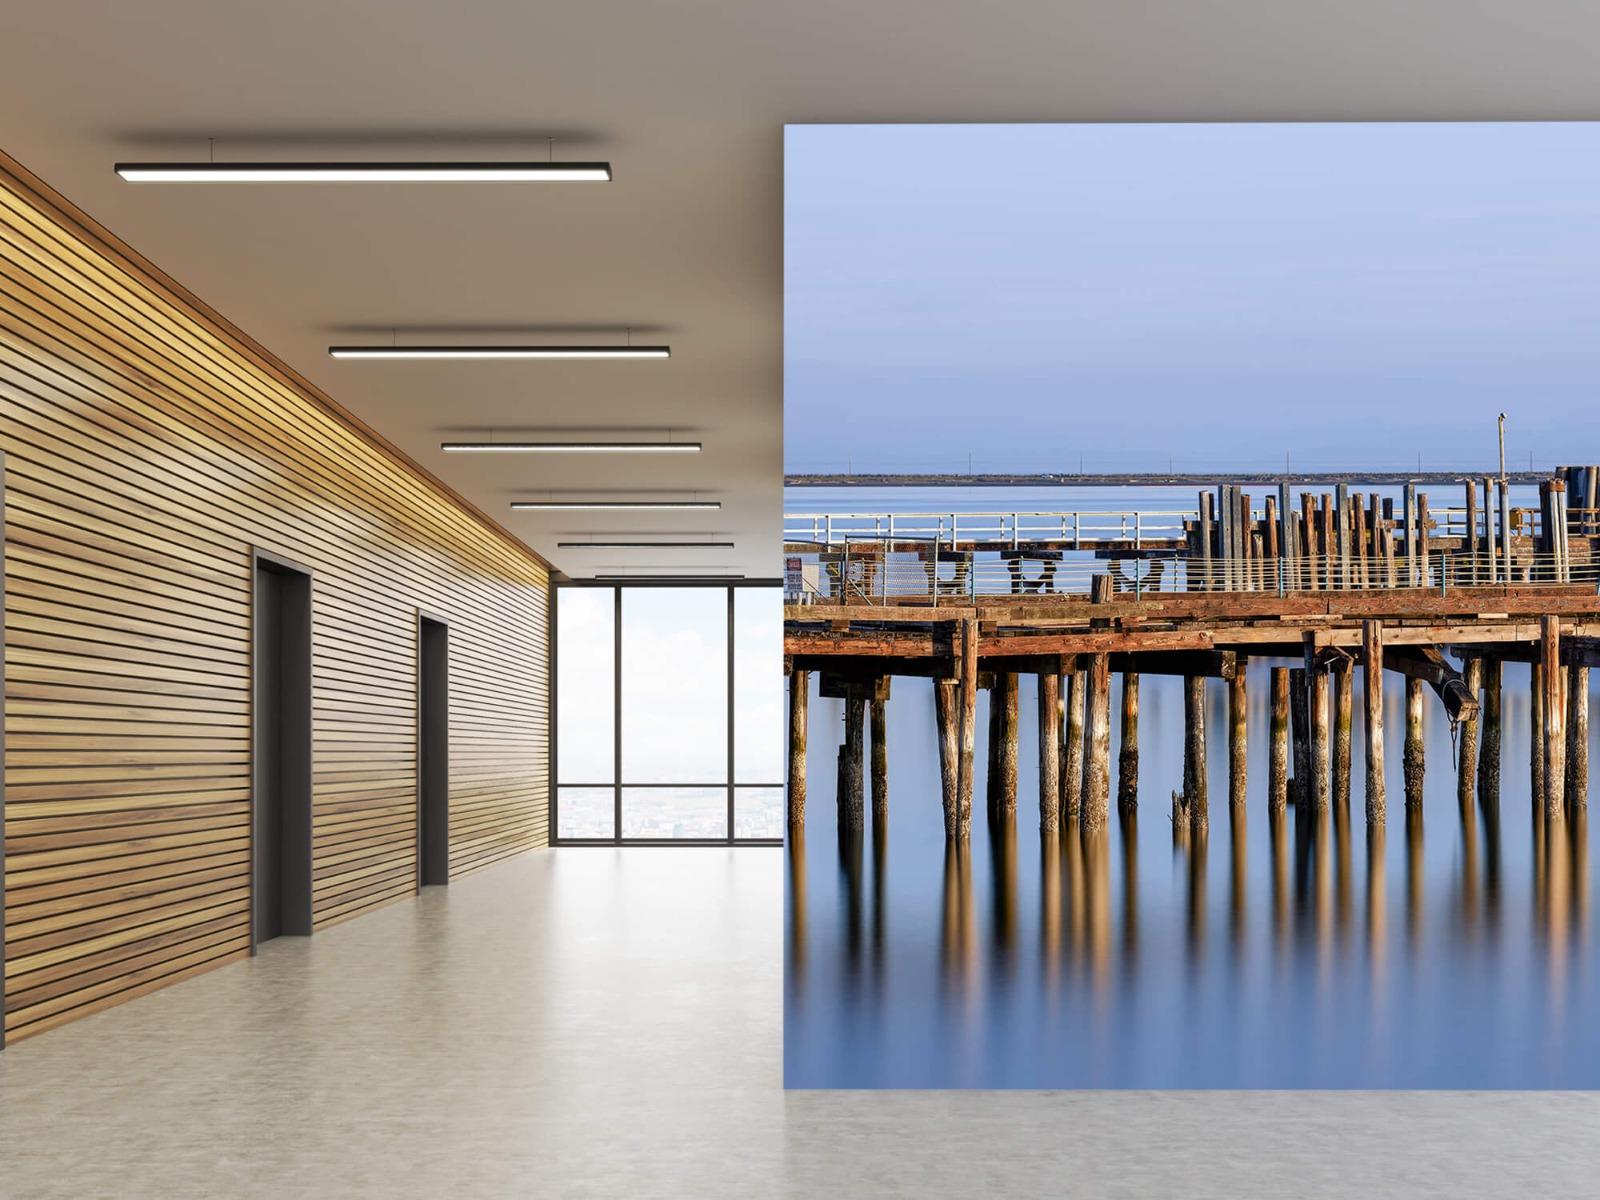 Houten Steigers - Steiger op houten palen - Wallexclusive - Slaapkamer 6